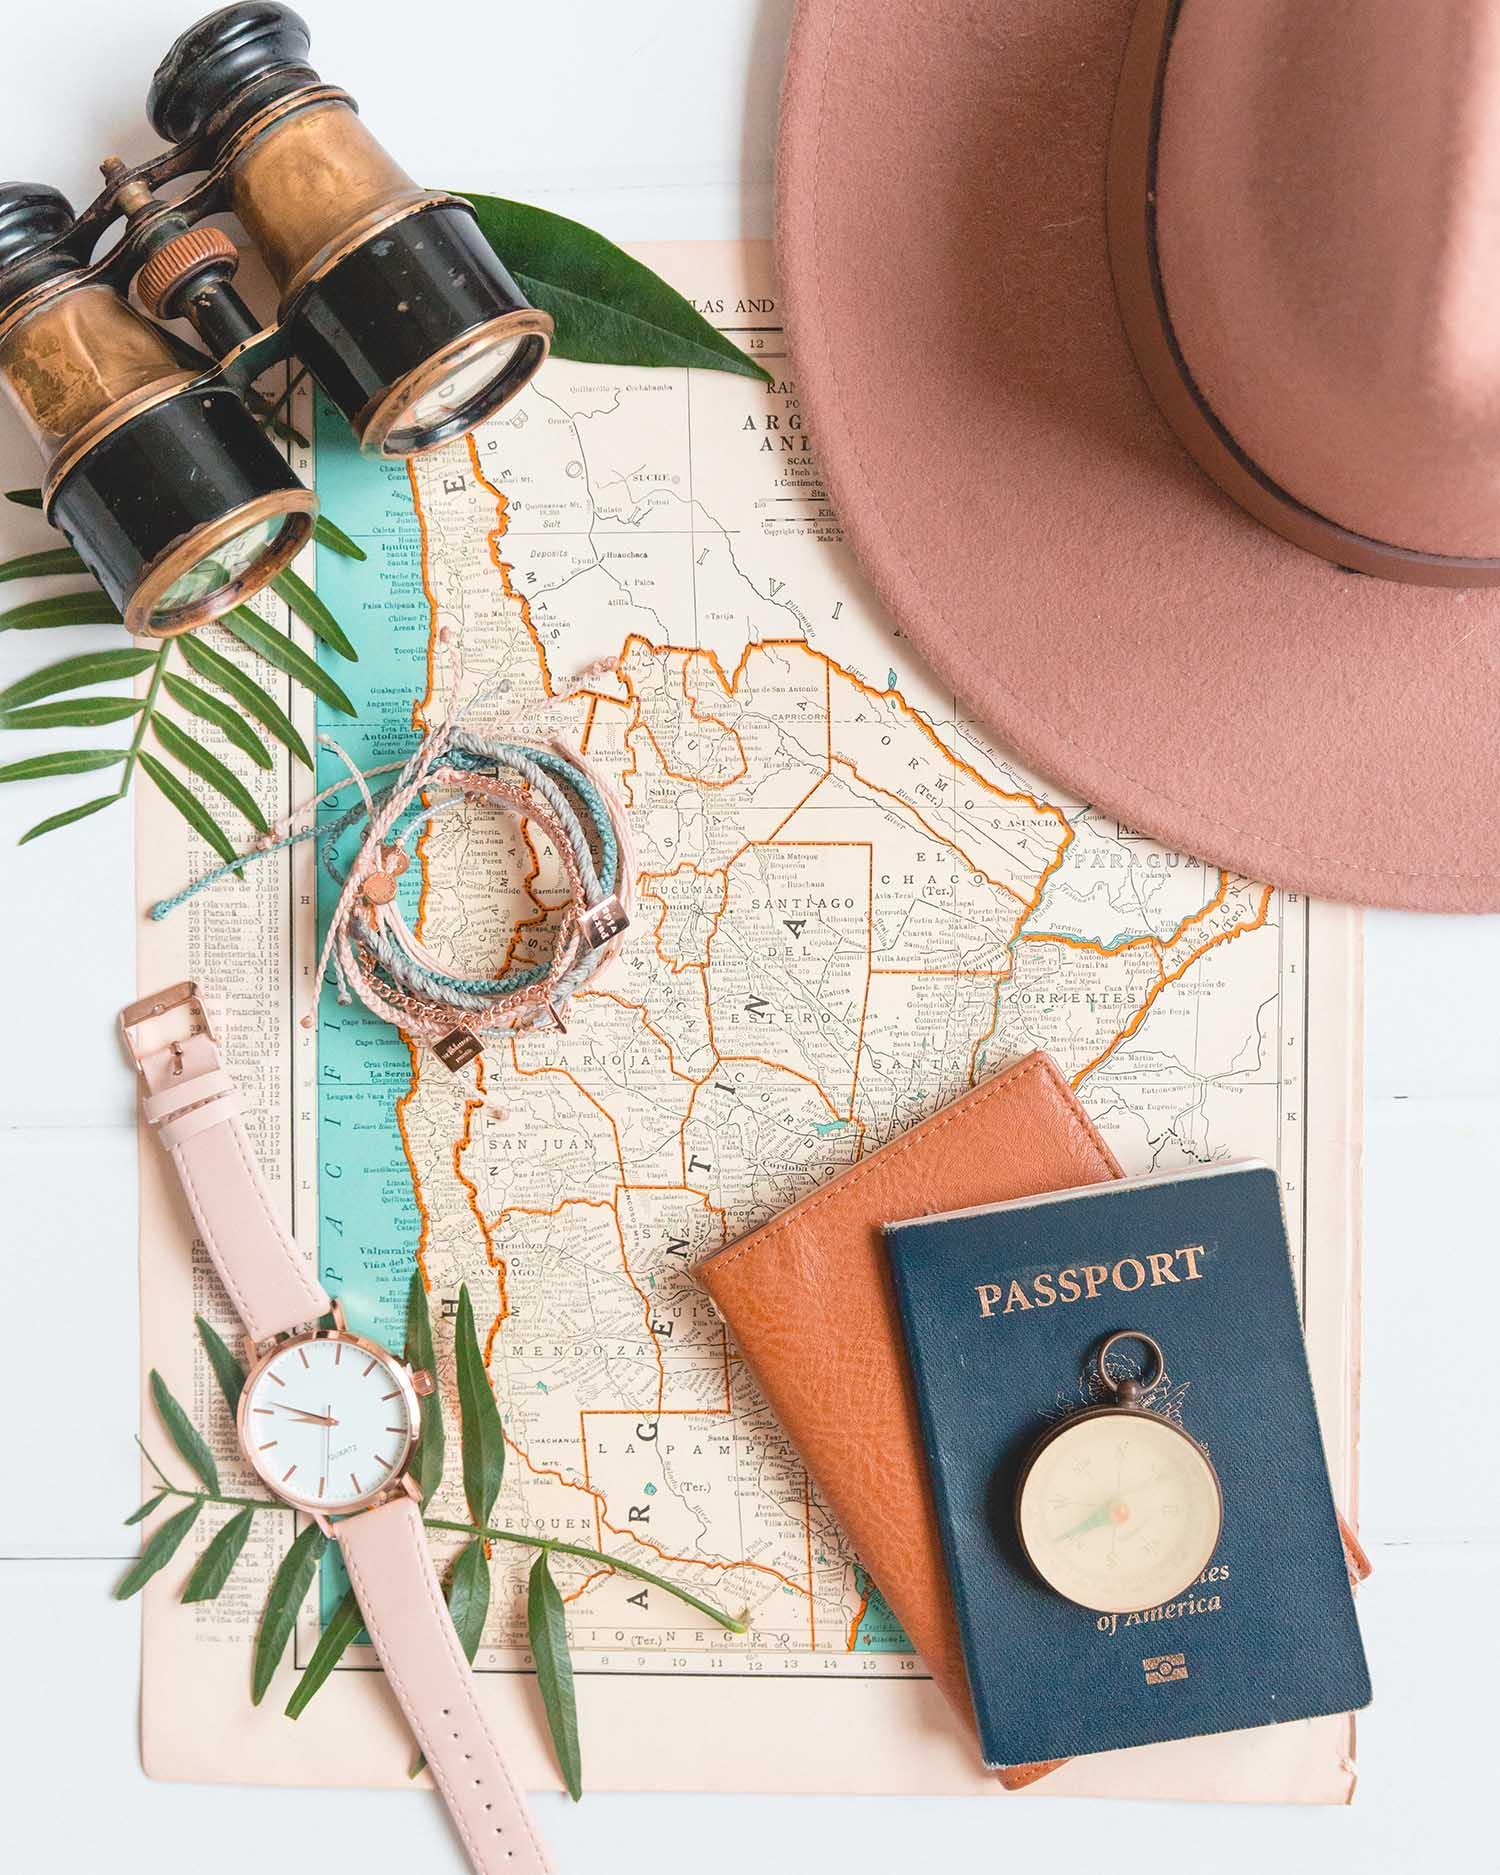 Travel Passport Flat Lay